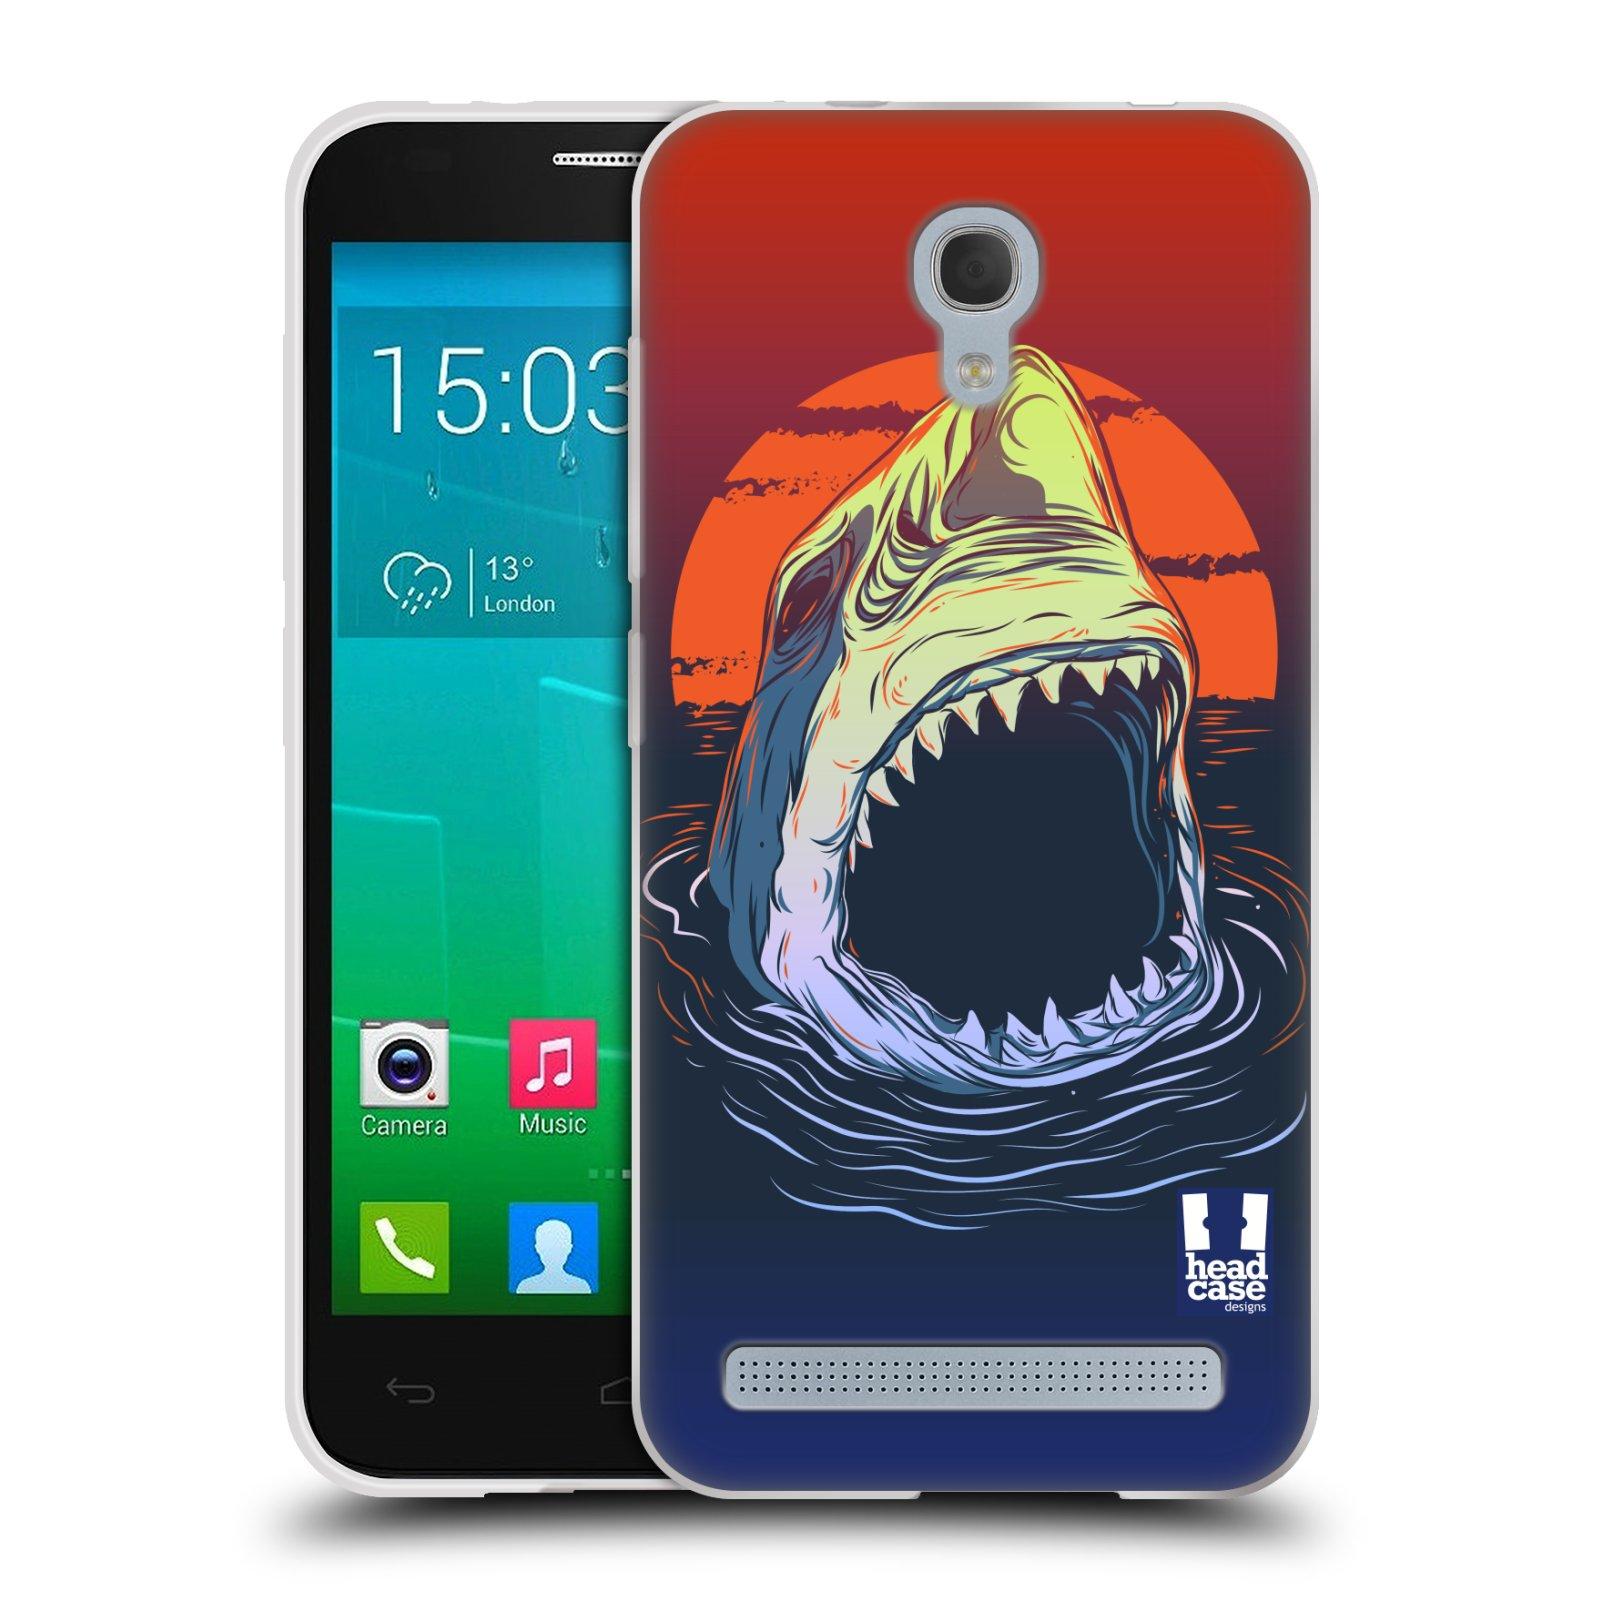 Silikonové pouzdro na mobil Alcatel One Touch Idol 2 Mini S 6036Y HEAD CASE HLADOVÝ ŽRALOK (Silikonový kryt či obal na mobilní telefon Alcatel Idol 2 Mini S OT-6036Y)